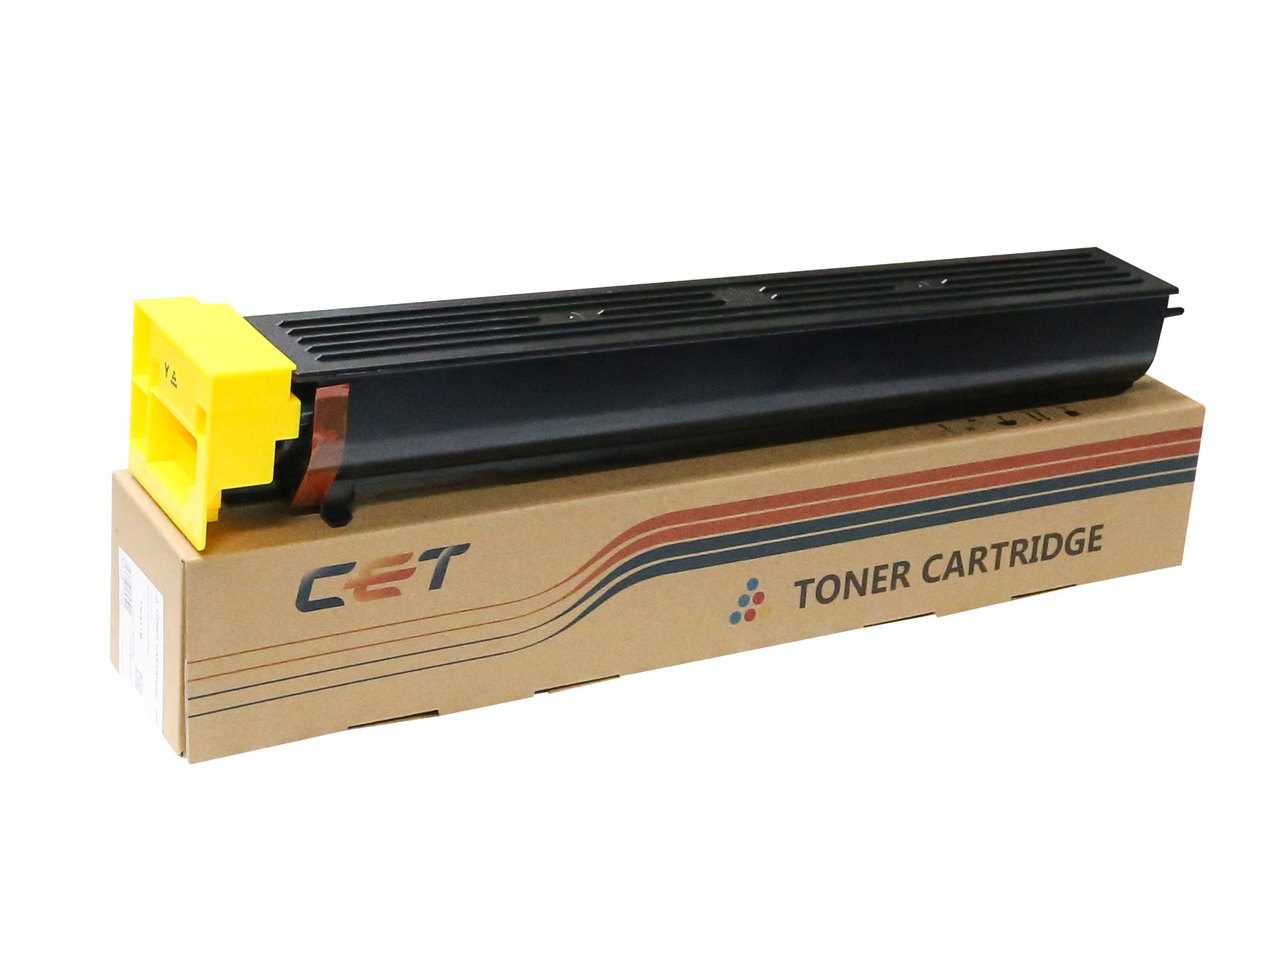 CET Group обновила дизайн упаковки